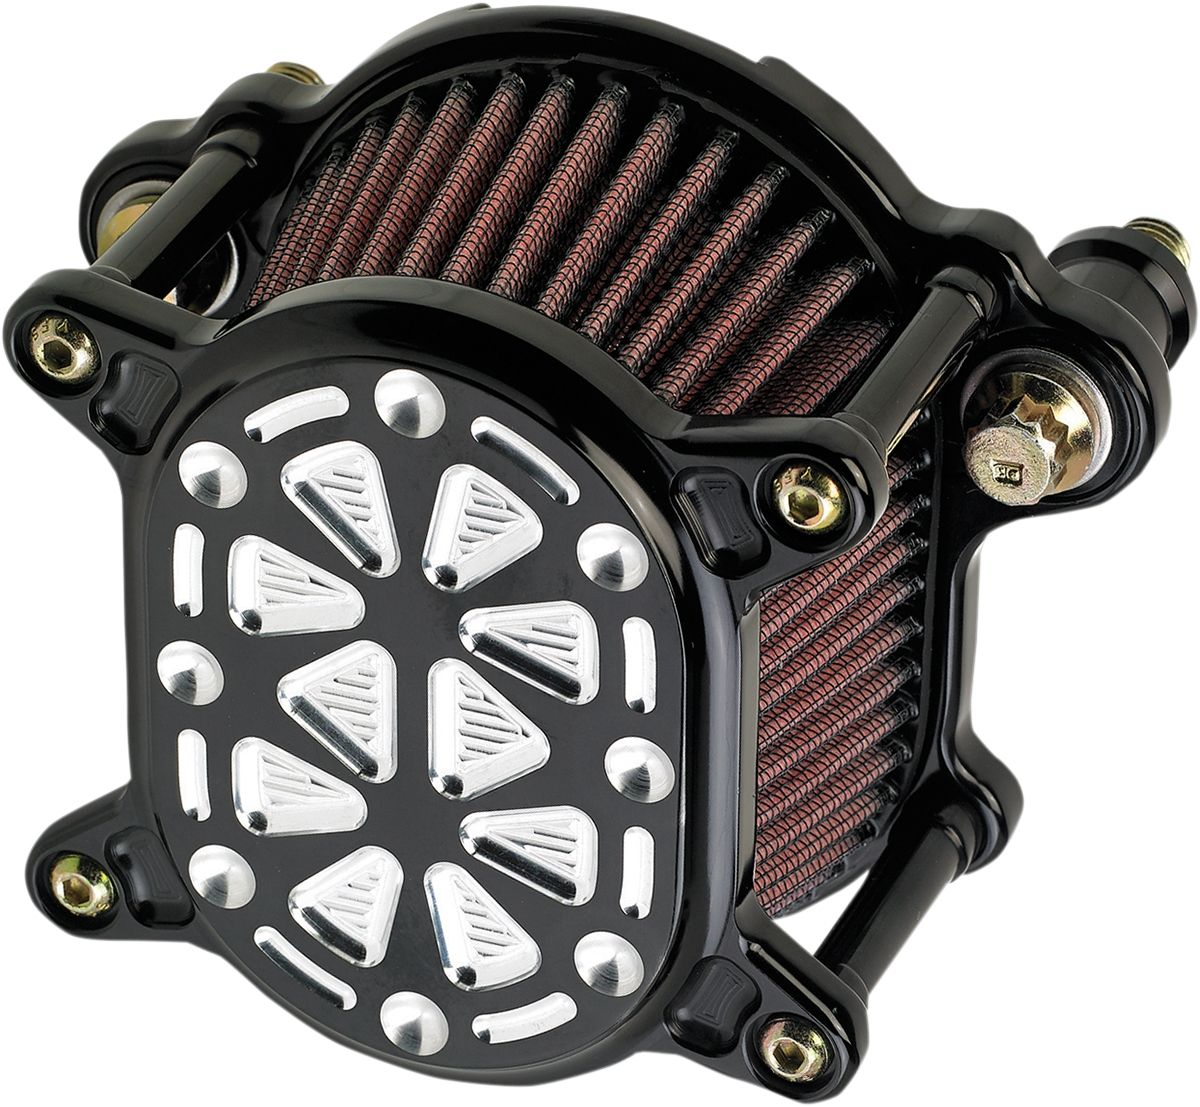 【JOKER MACHINE】空氣濾清器 OMEGA XLEFI Tech 黑色/銀色 【A/C OMEGA XLEFI TCH BL/SL [1001-0055]】 - 「Webike-摩托百貨」